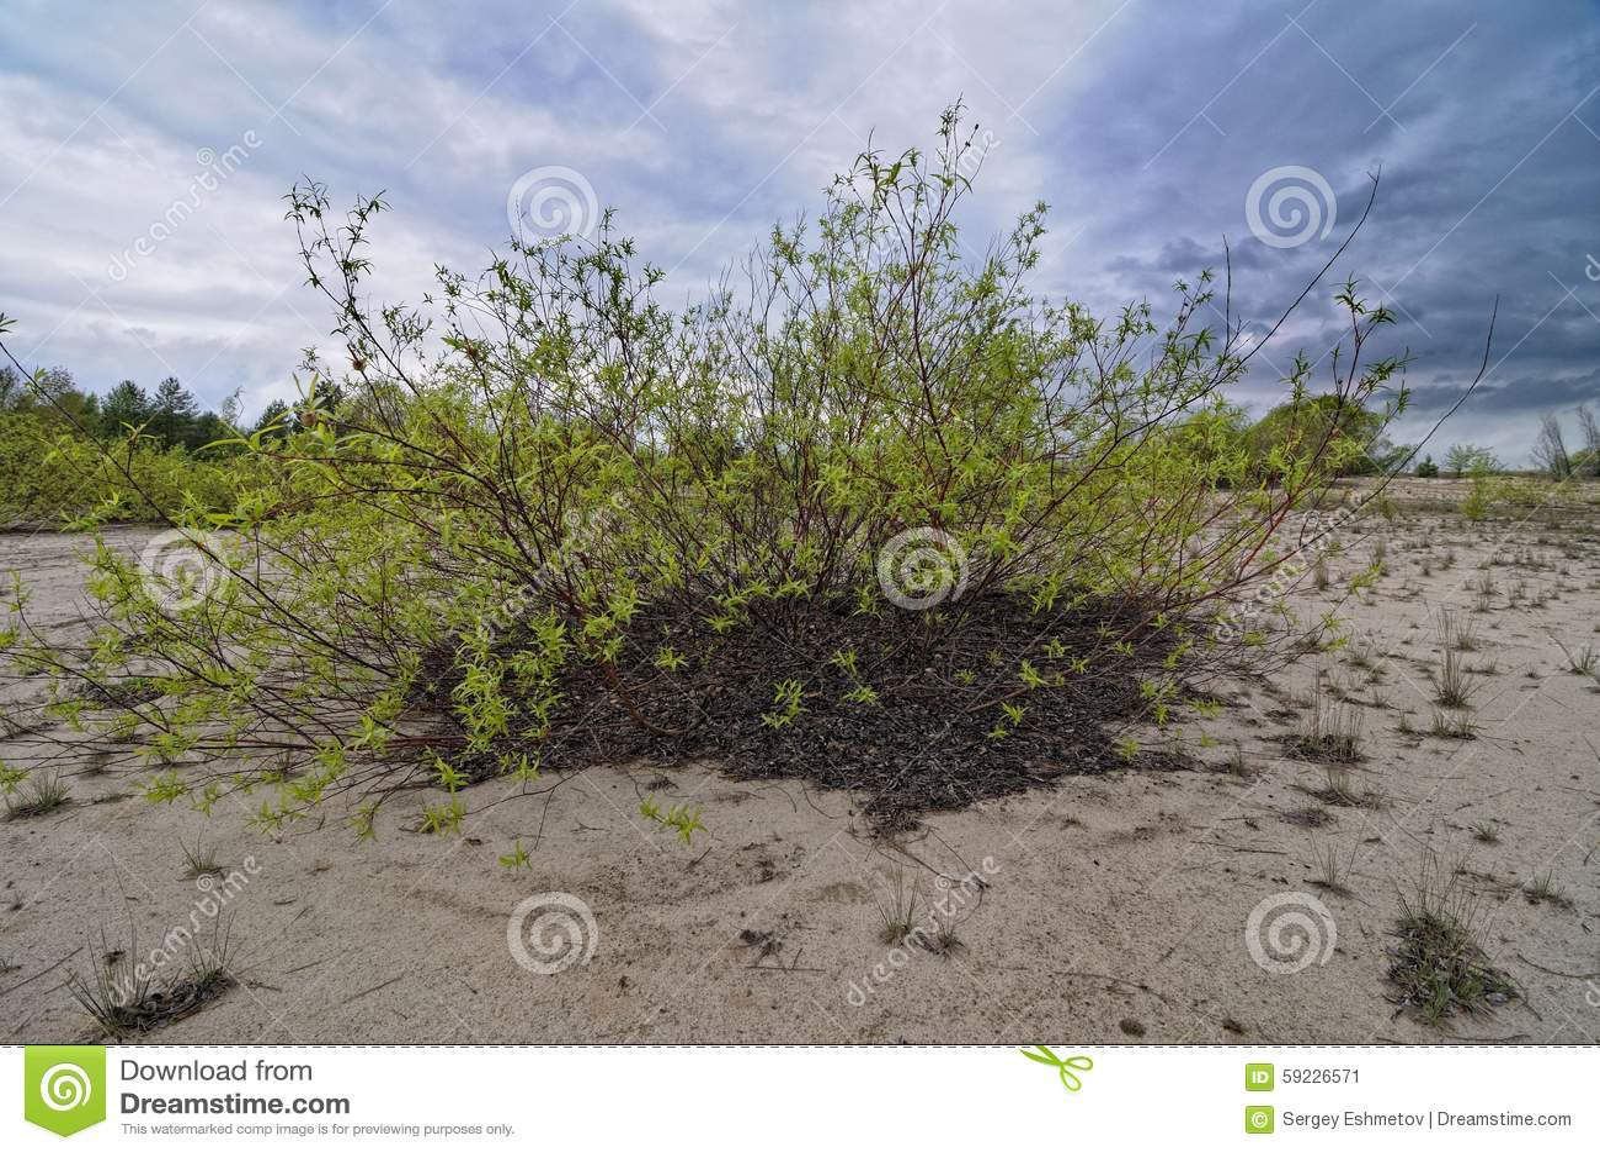 Download Sandy Beach imagen de archivo. Imagen de paisaje, campo - 59226571